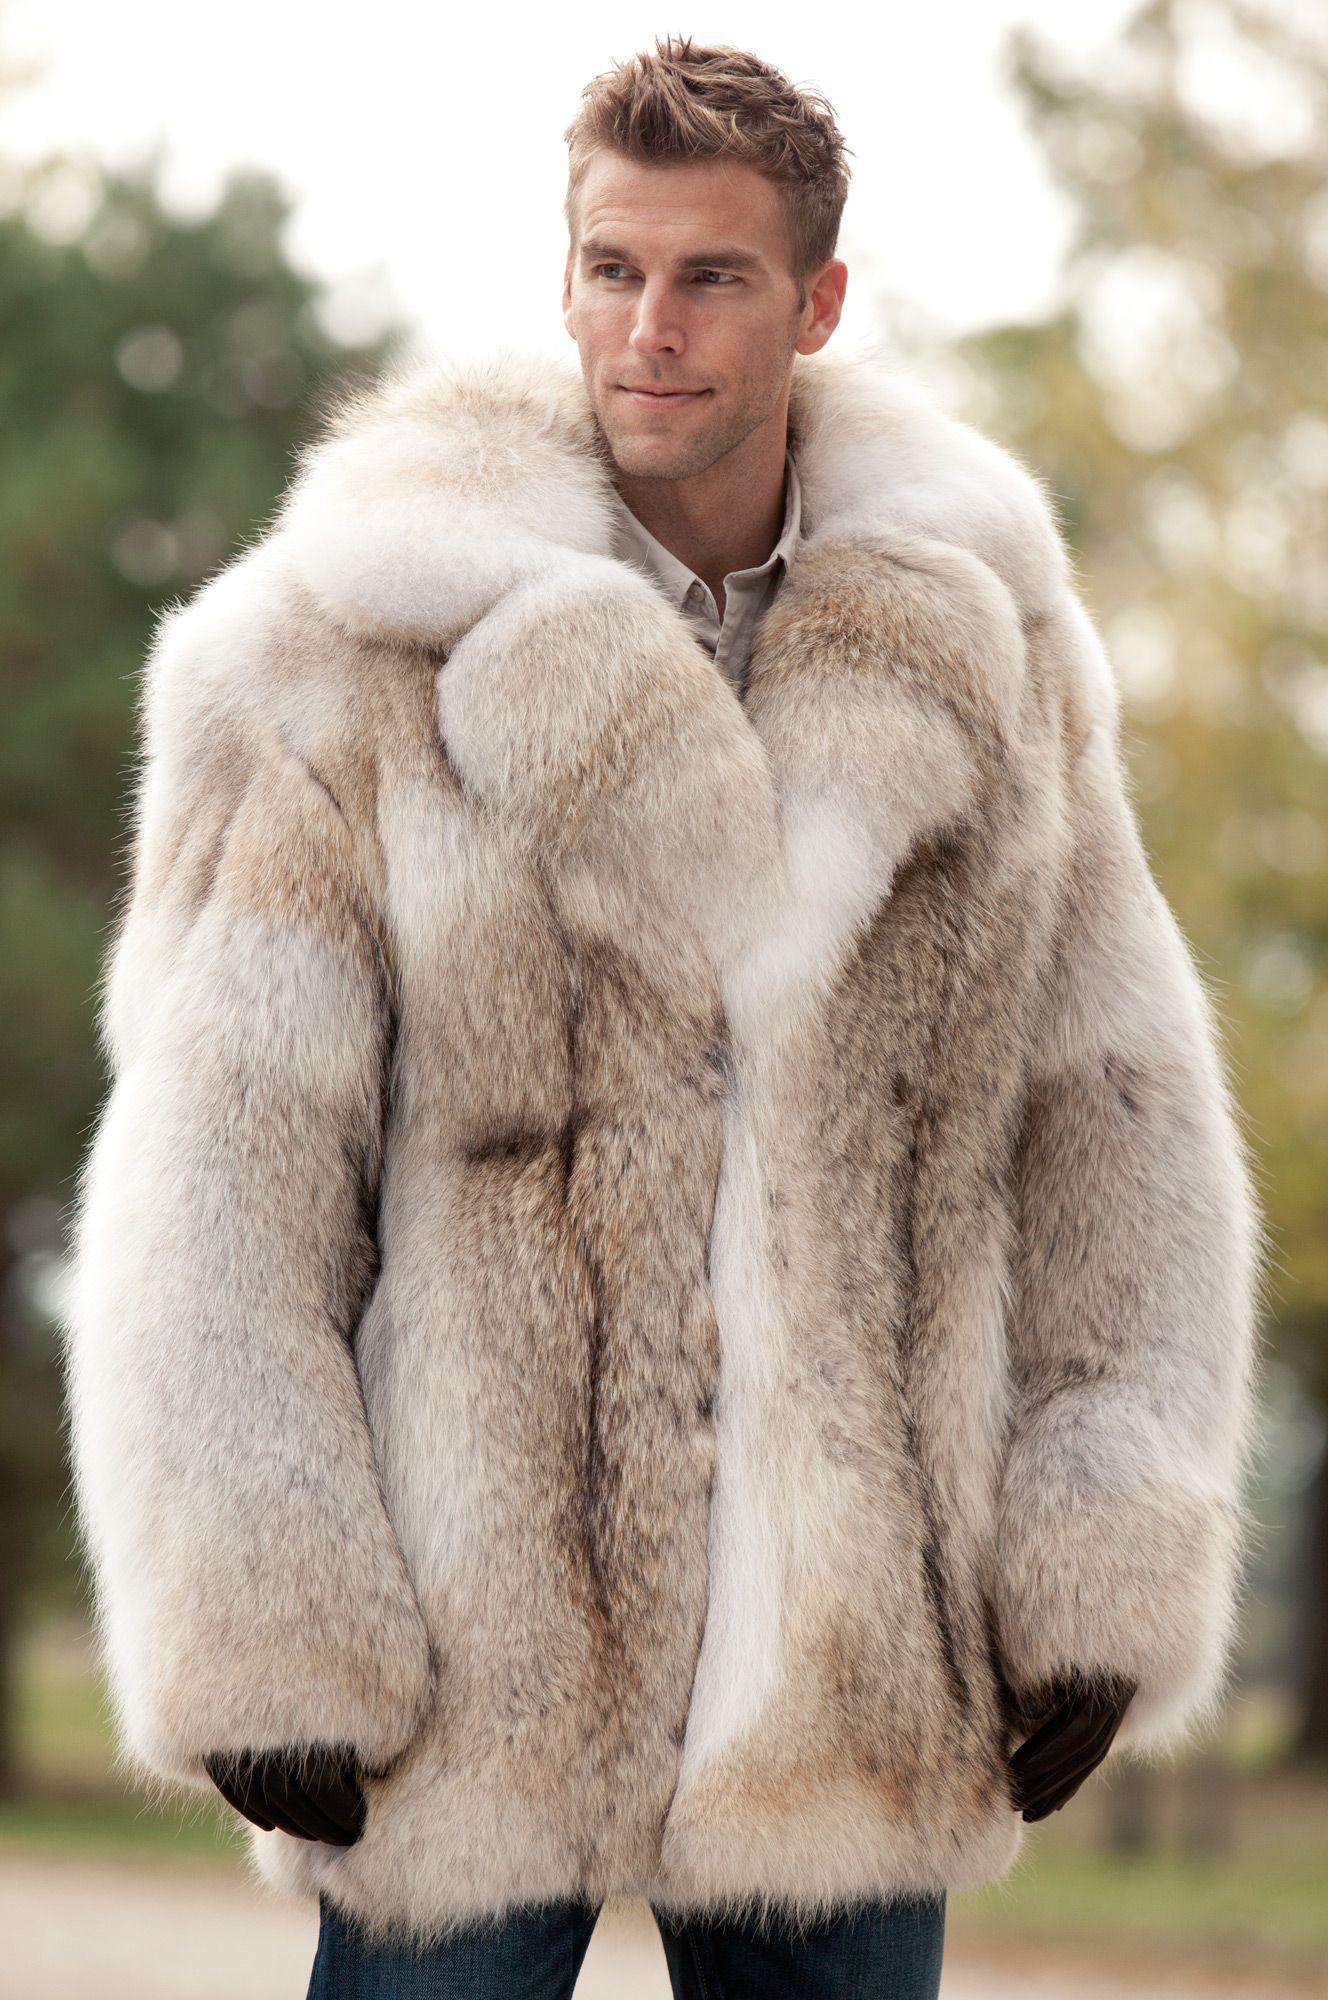 Zack Coyote Fur Jacket #12127 | Coats & Jackets | Pinterest ...